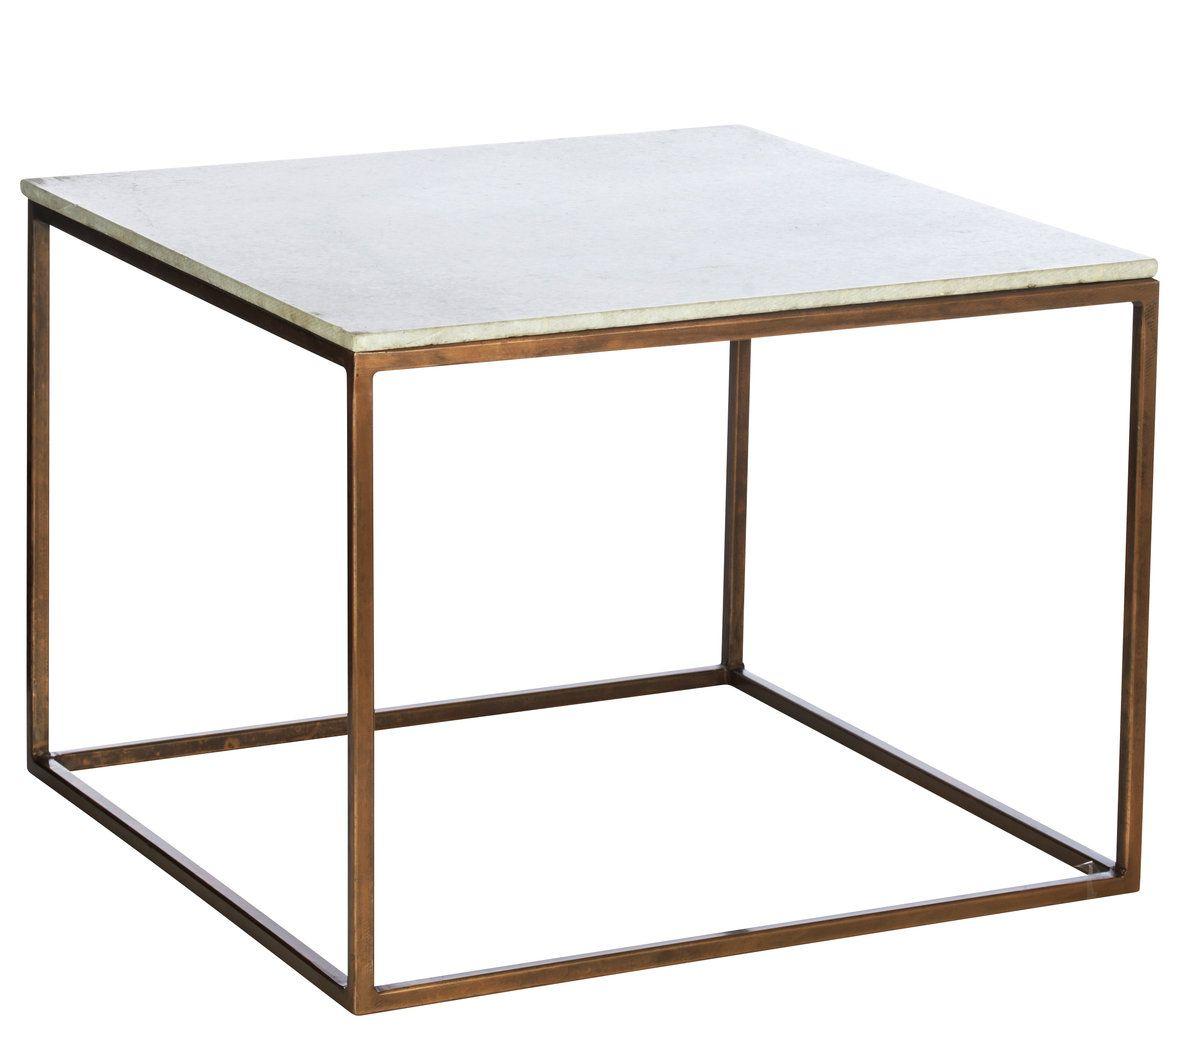 Vintage wohnzimmertisch marble copper table  copper coffee table  design vintage